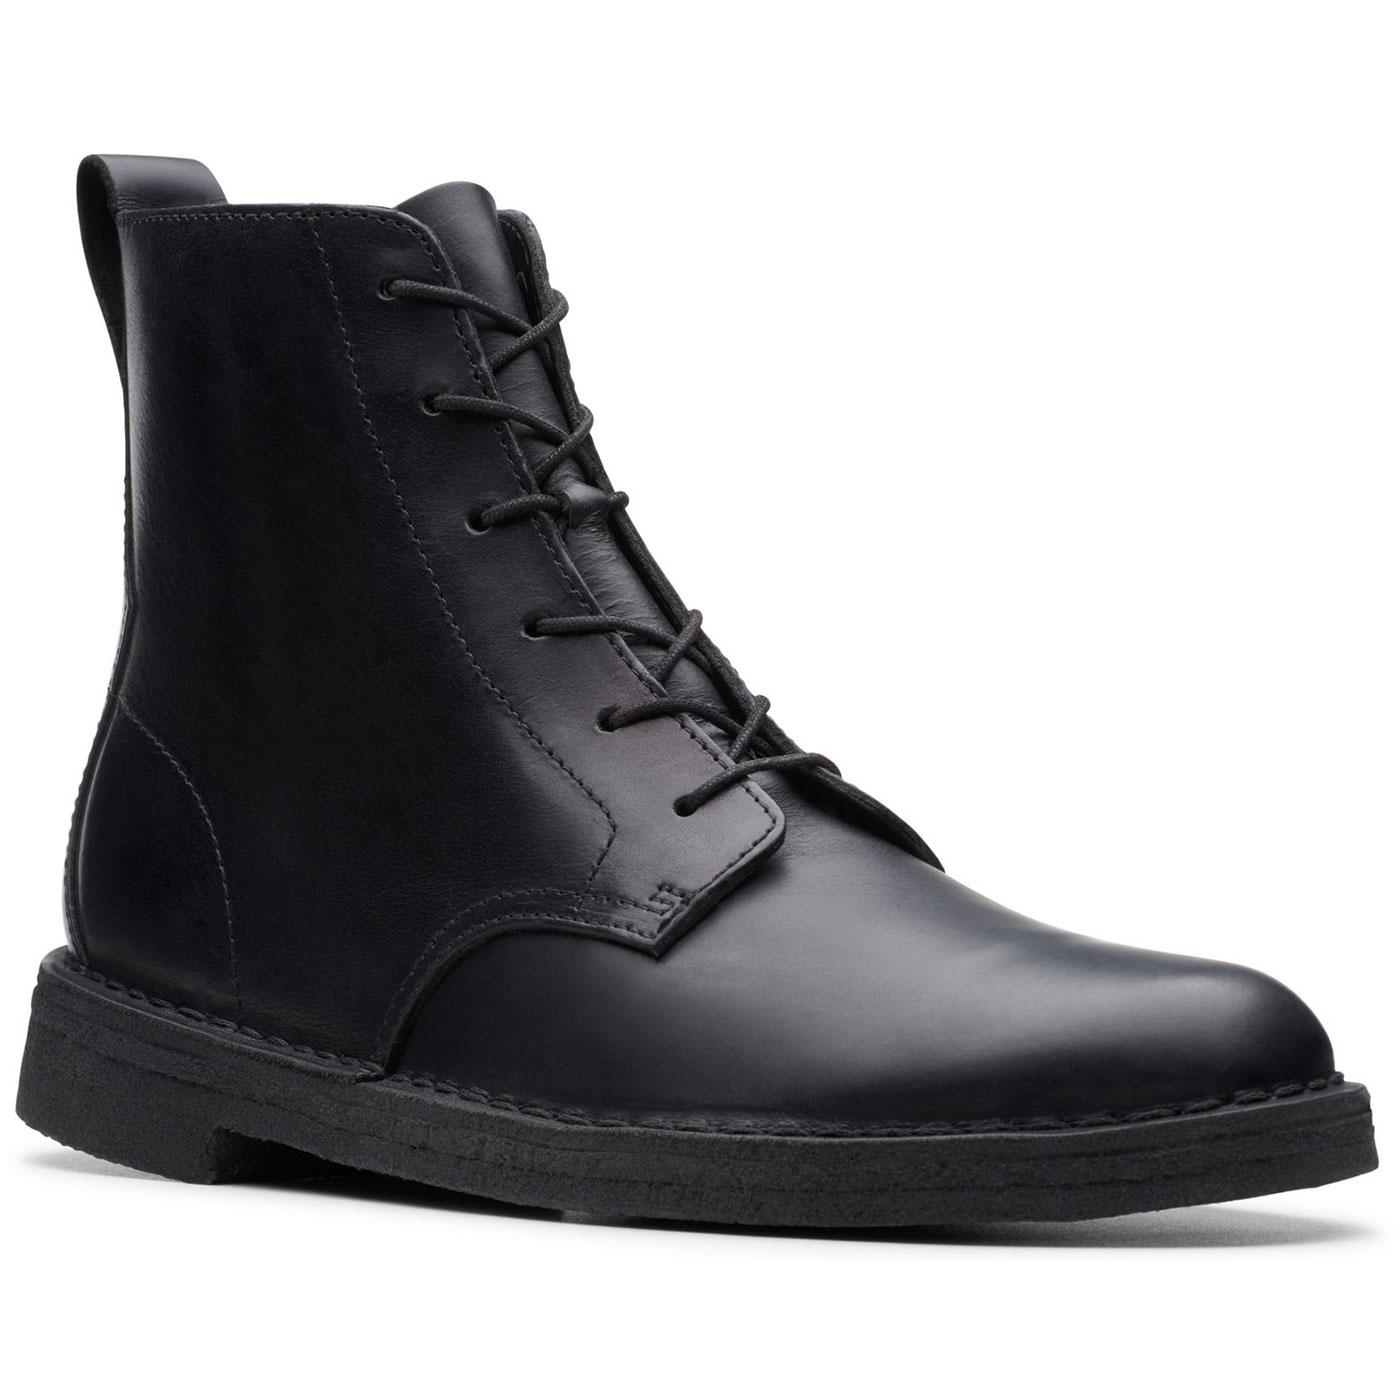 Desert Mali CLARKS ORIGINALS Leather Ankle Boots B